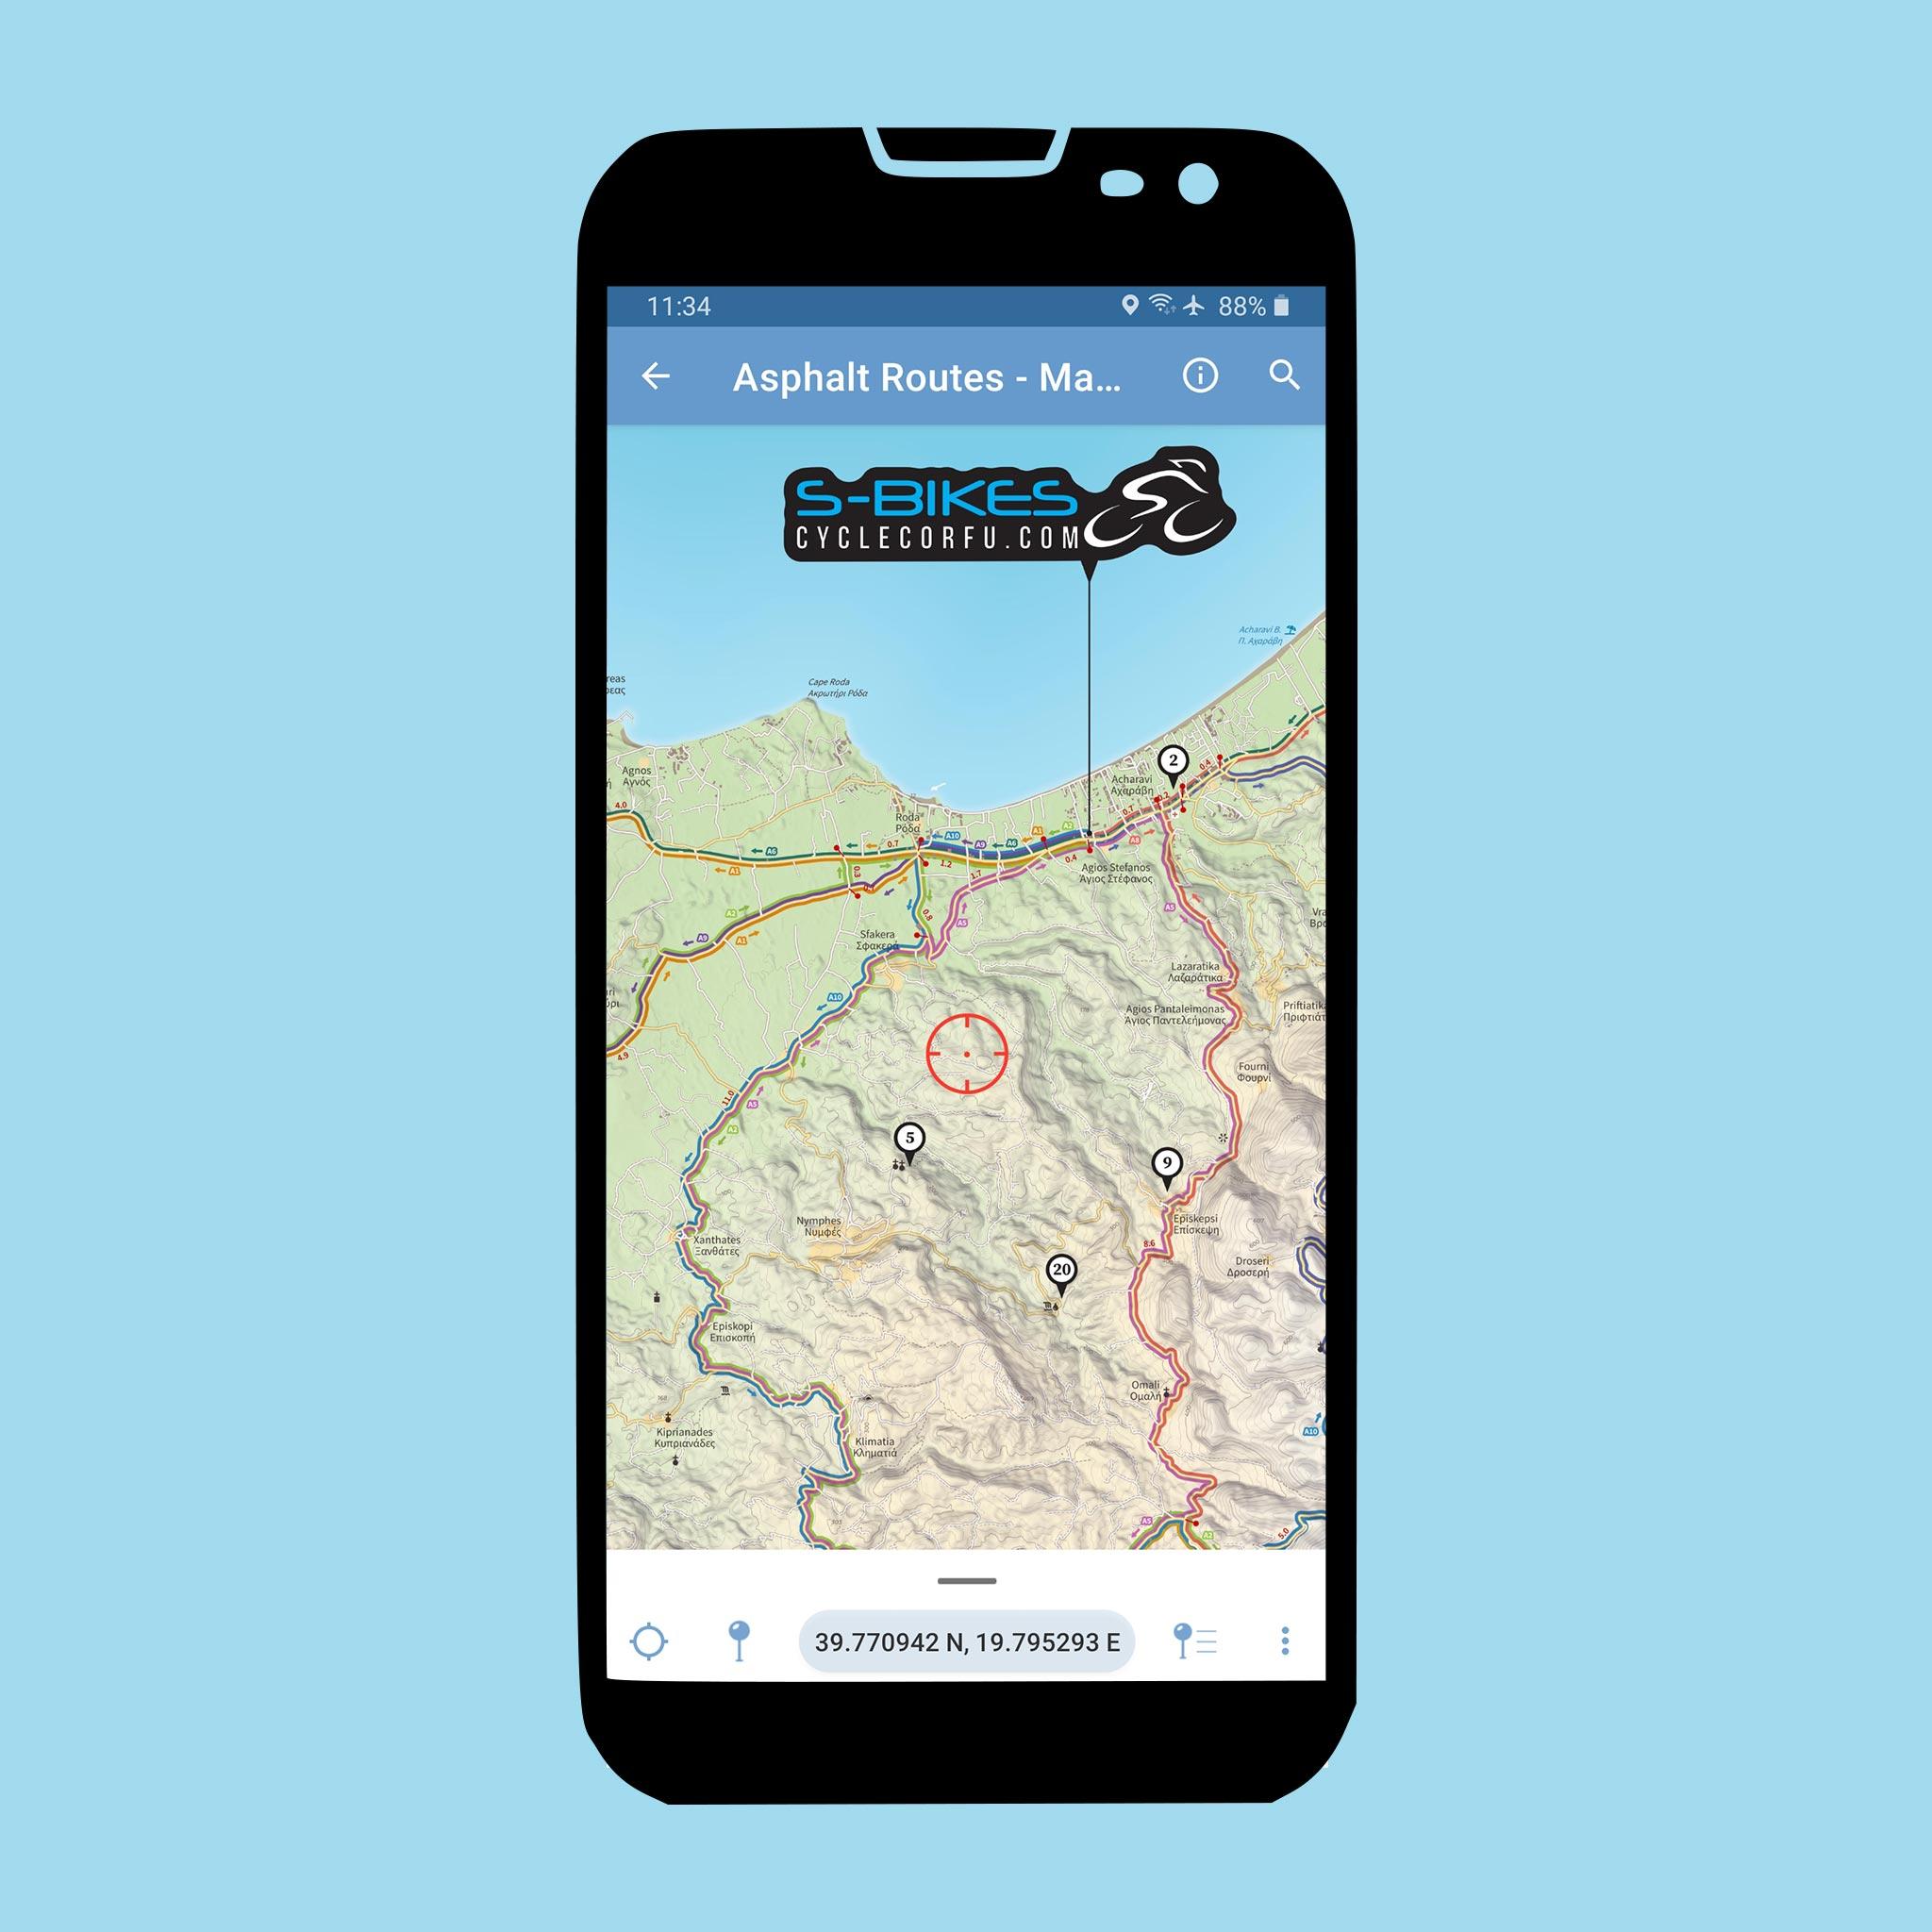 S-Bikes Cycle Corfu - Asphalt Routes - Avenza Maps app